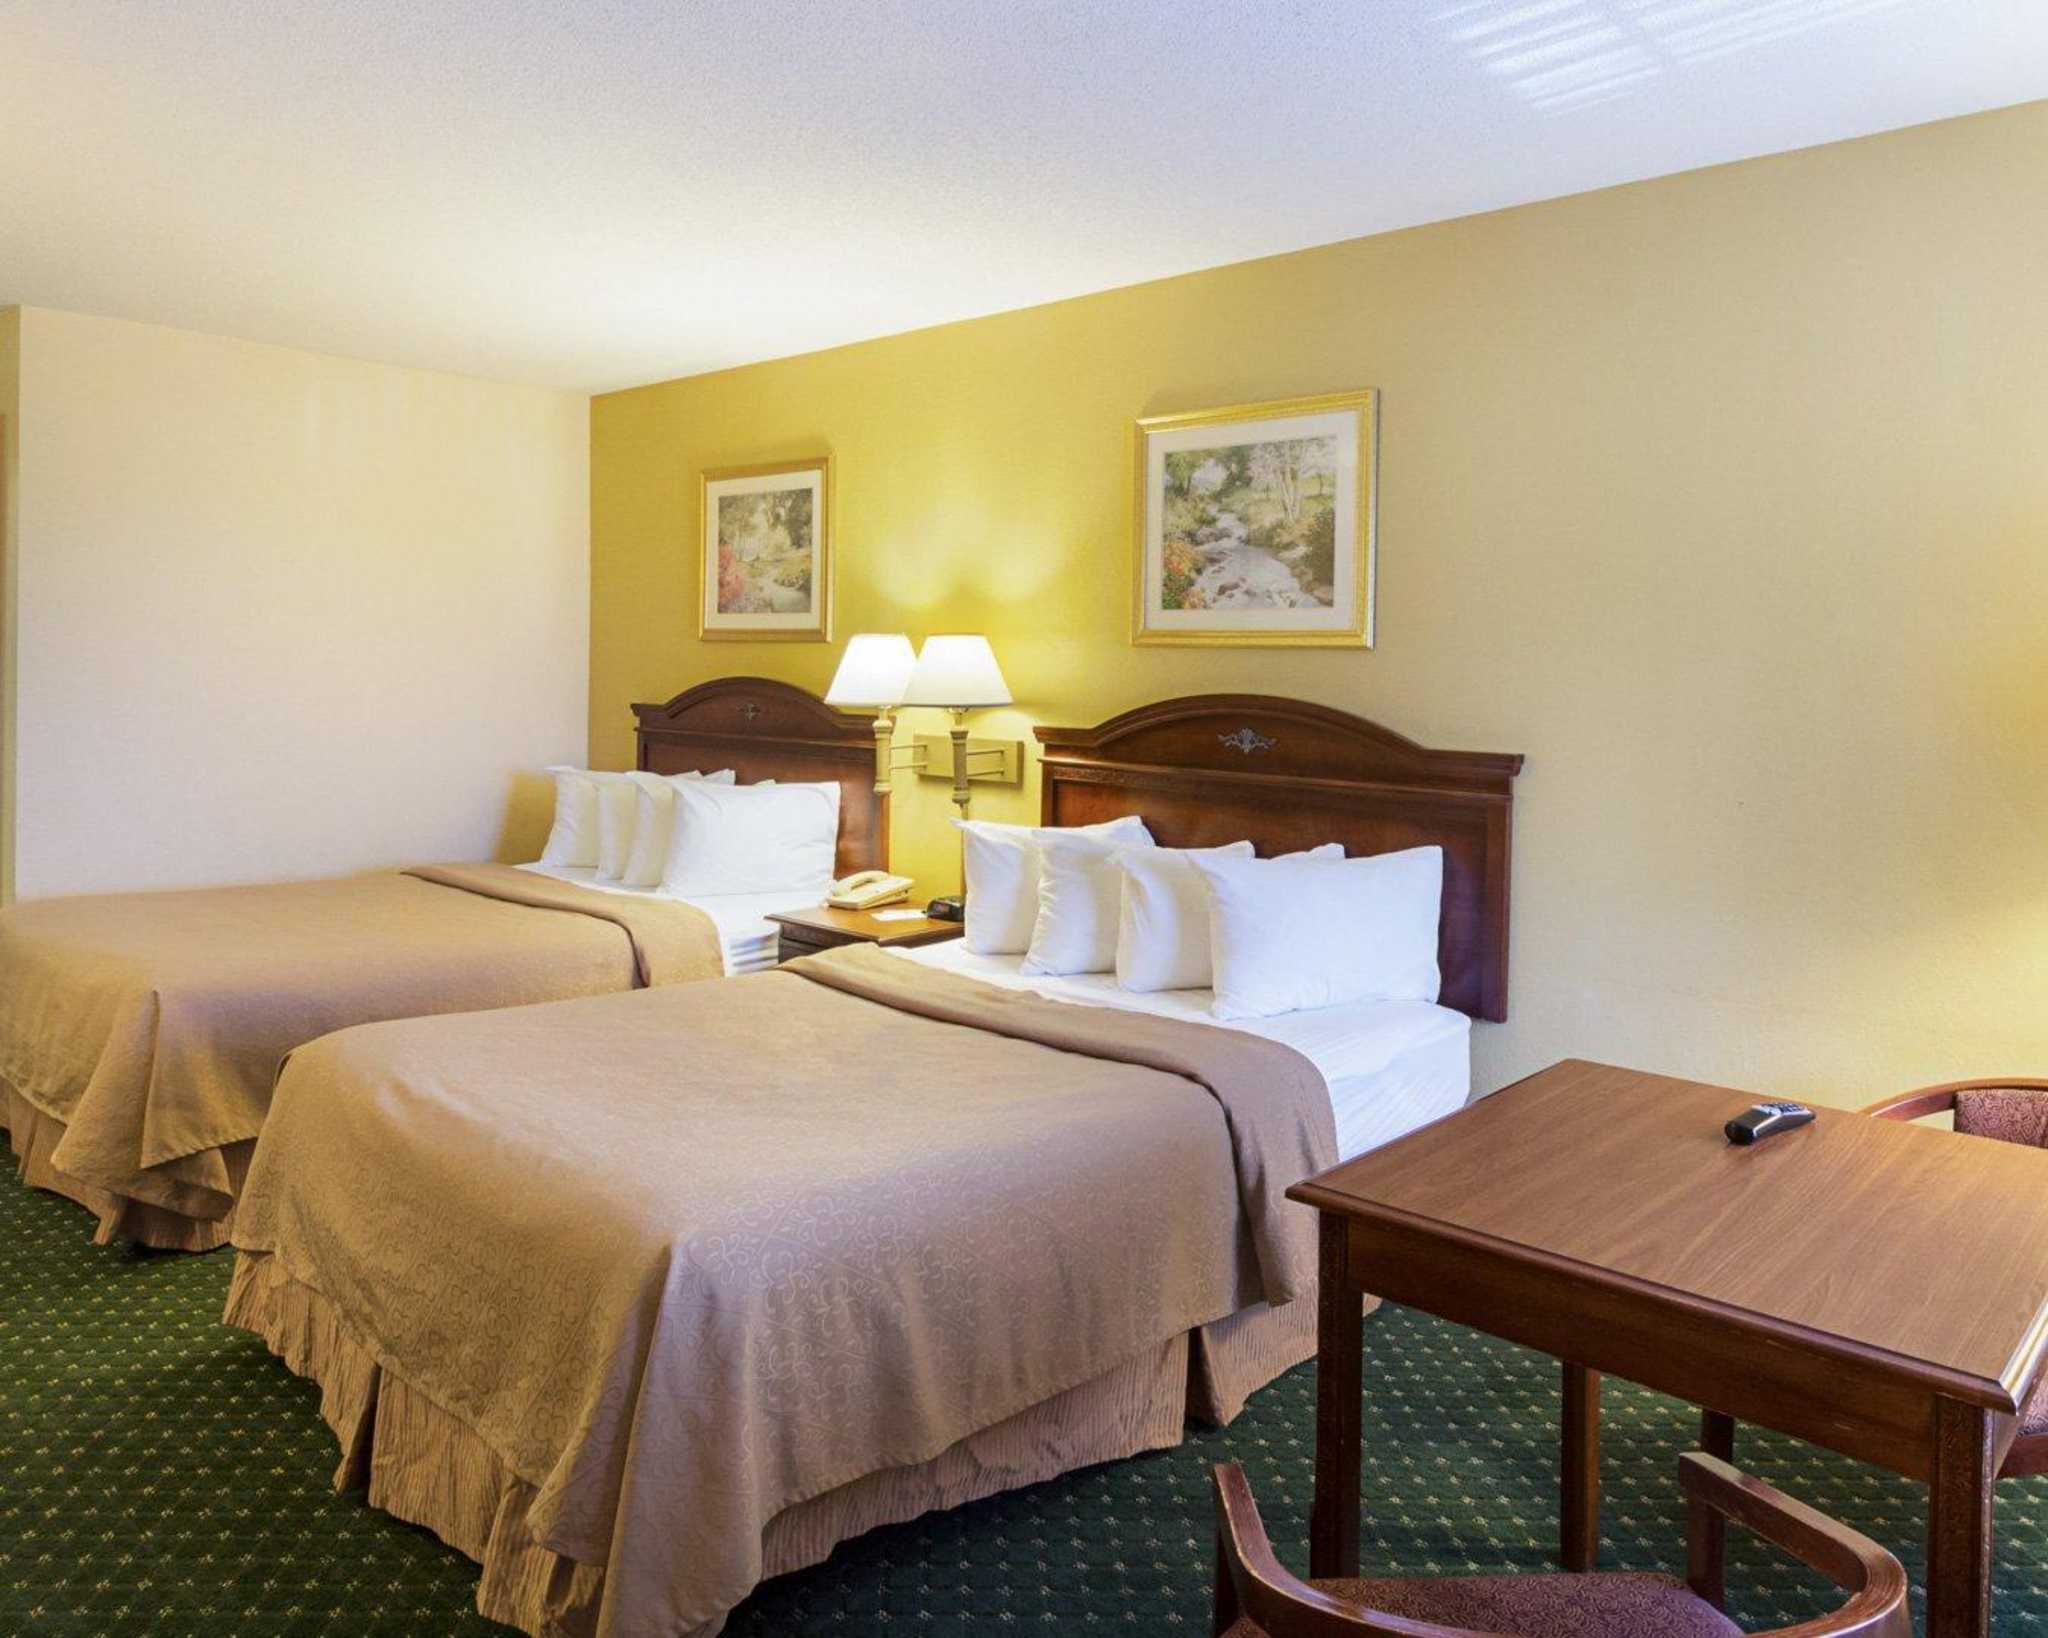 Quality Inn & Suites Southwest image 5